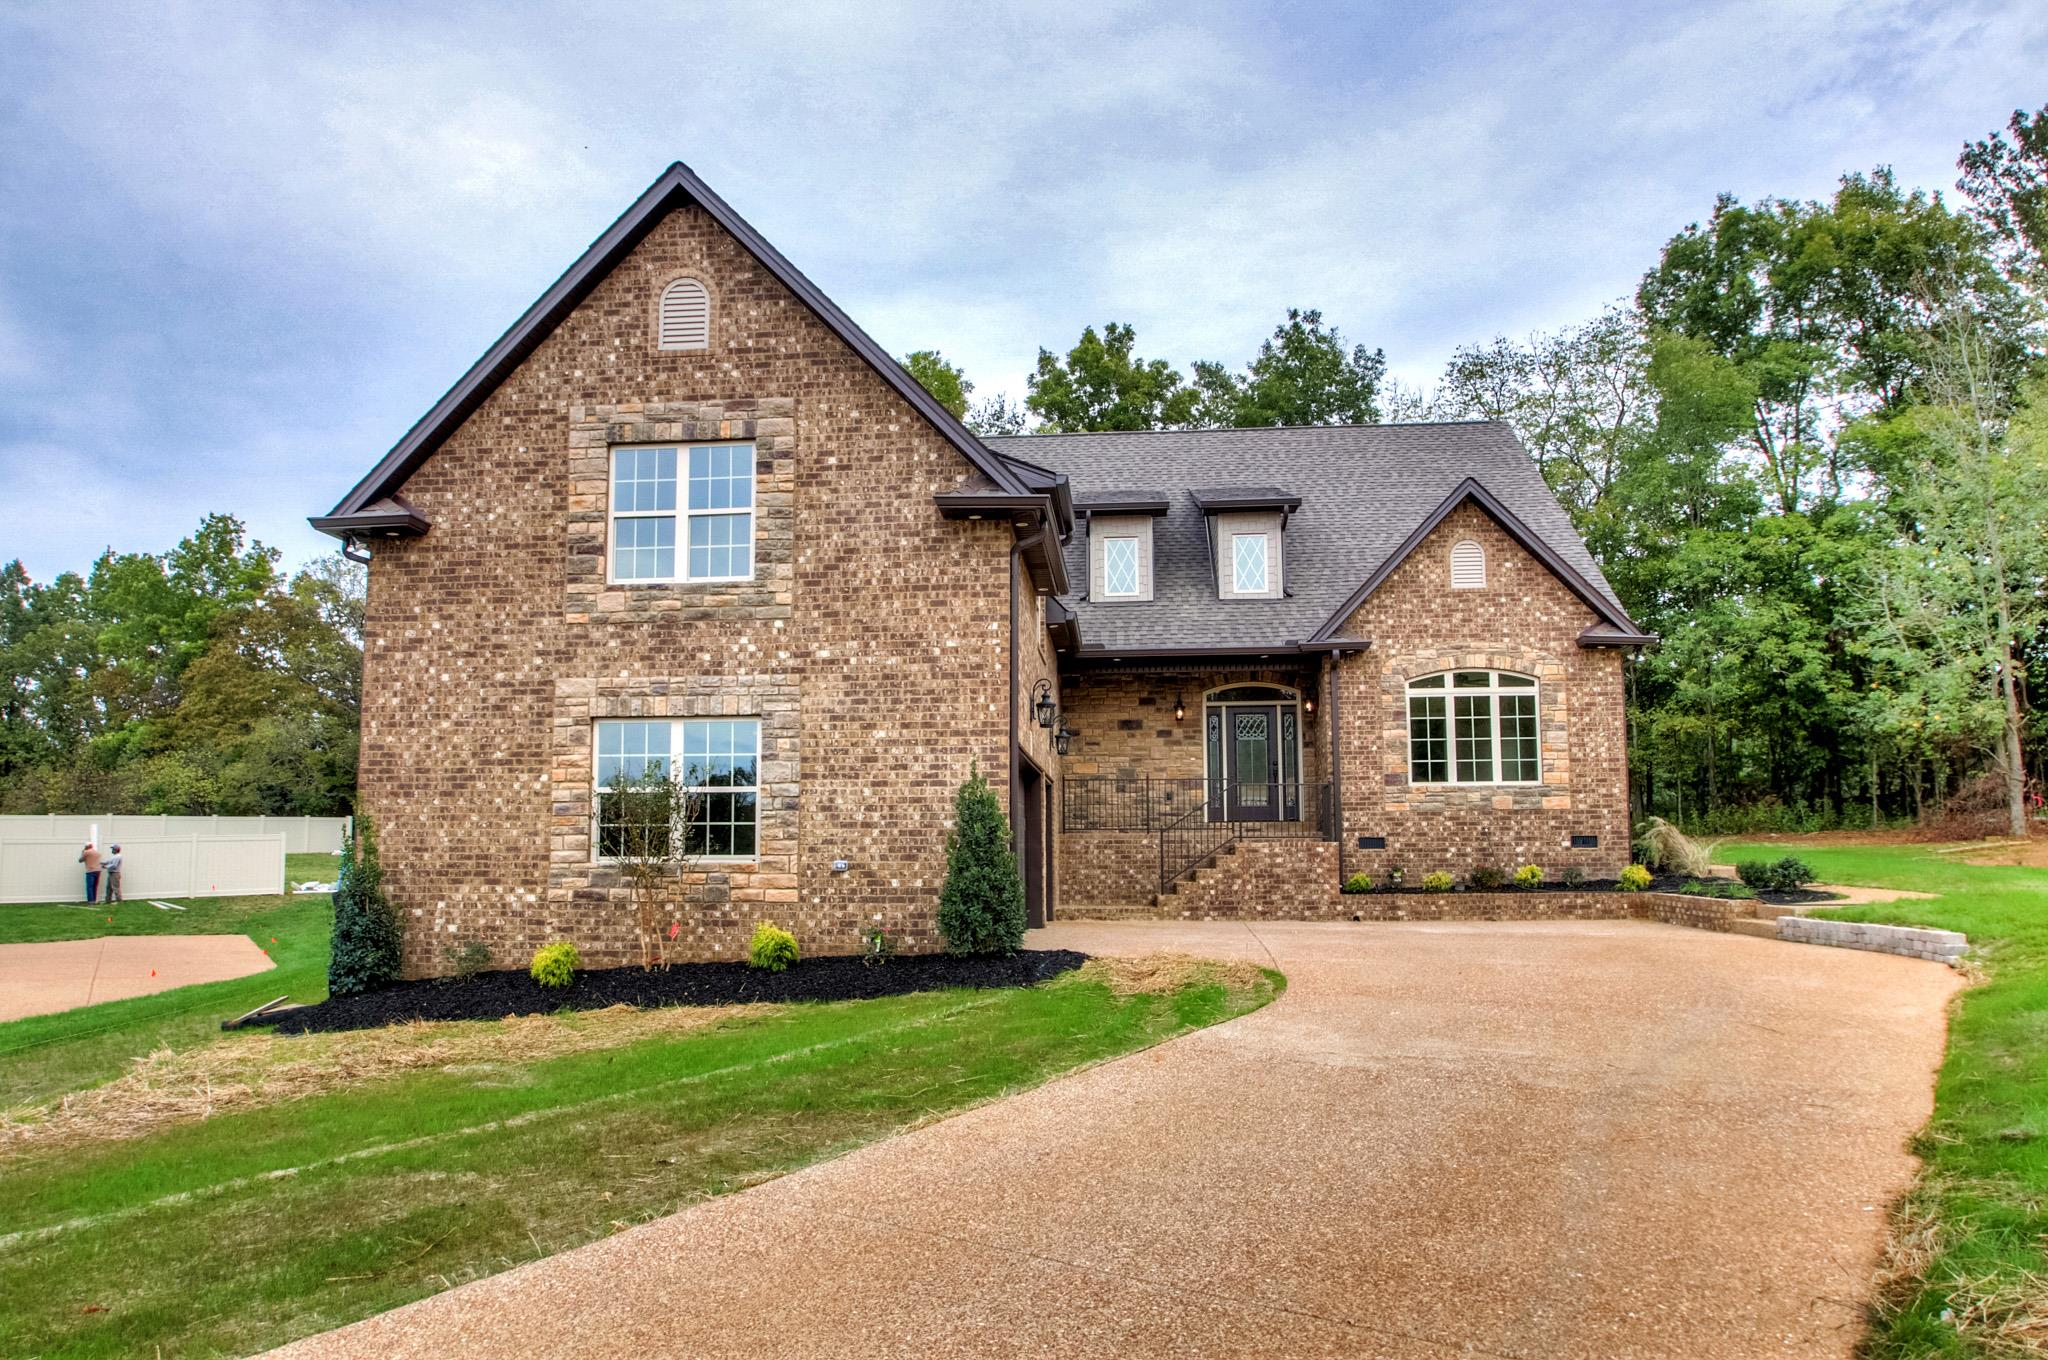 217 Ivie Lane, Lebanon, TN 37087 - Lebanon, TN real estate listing